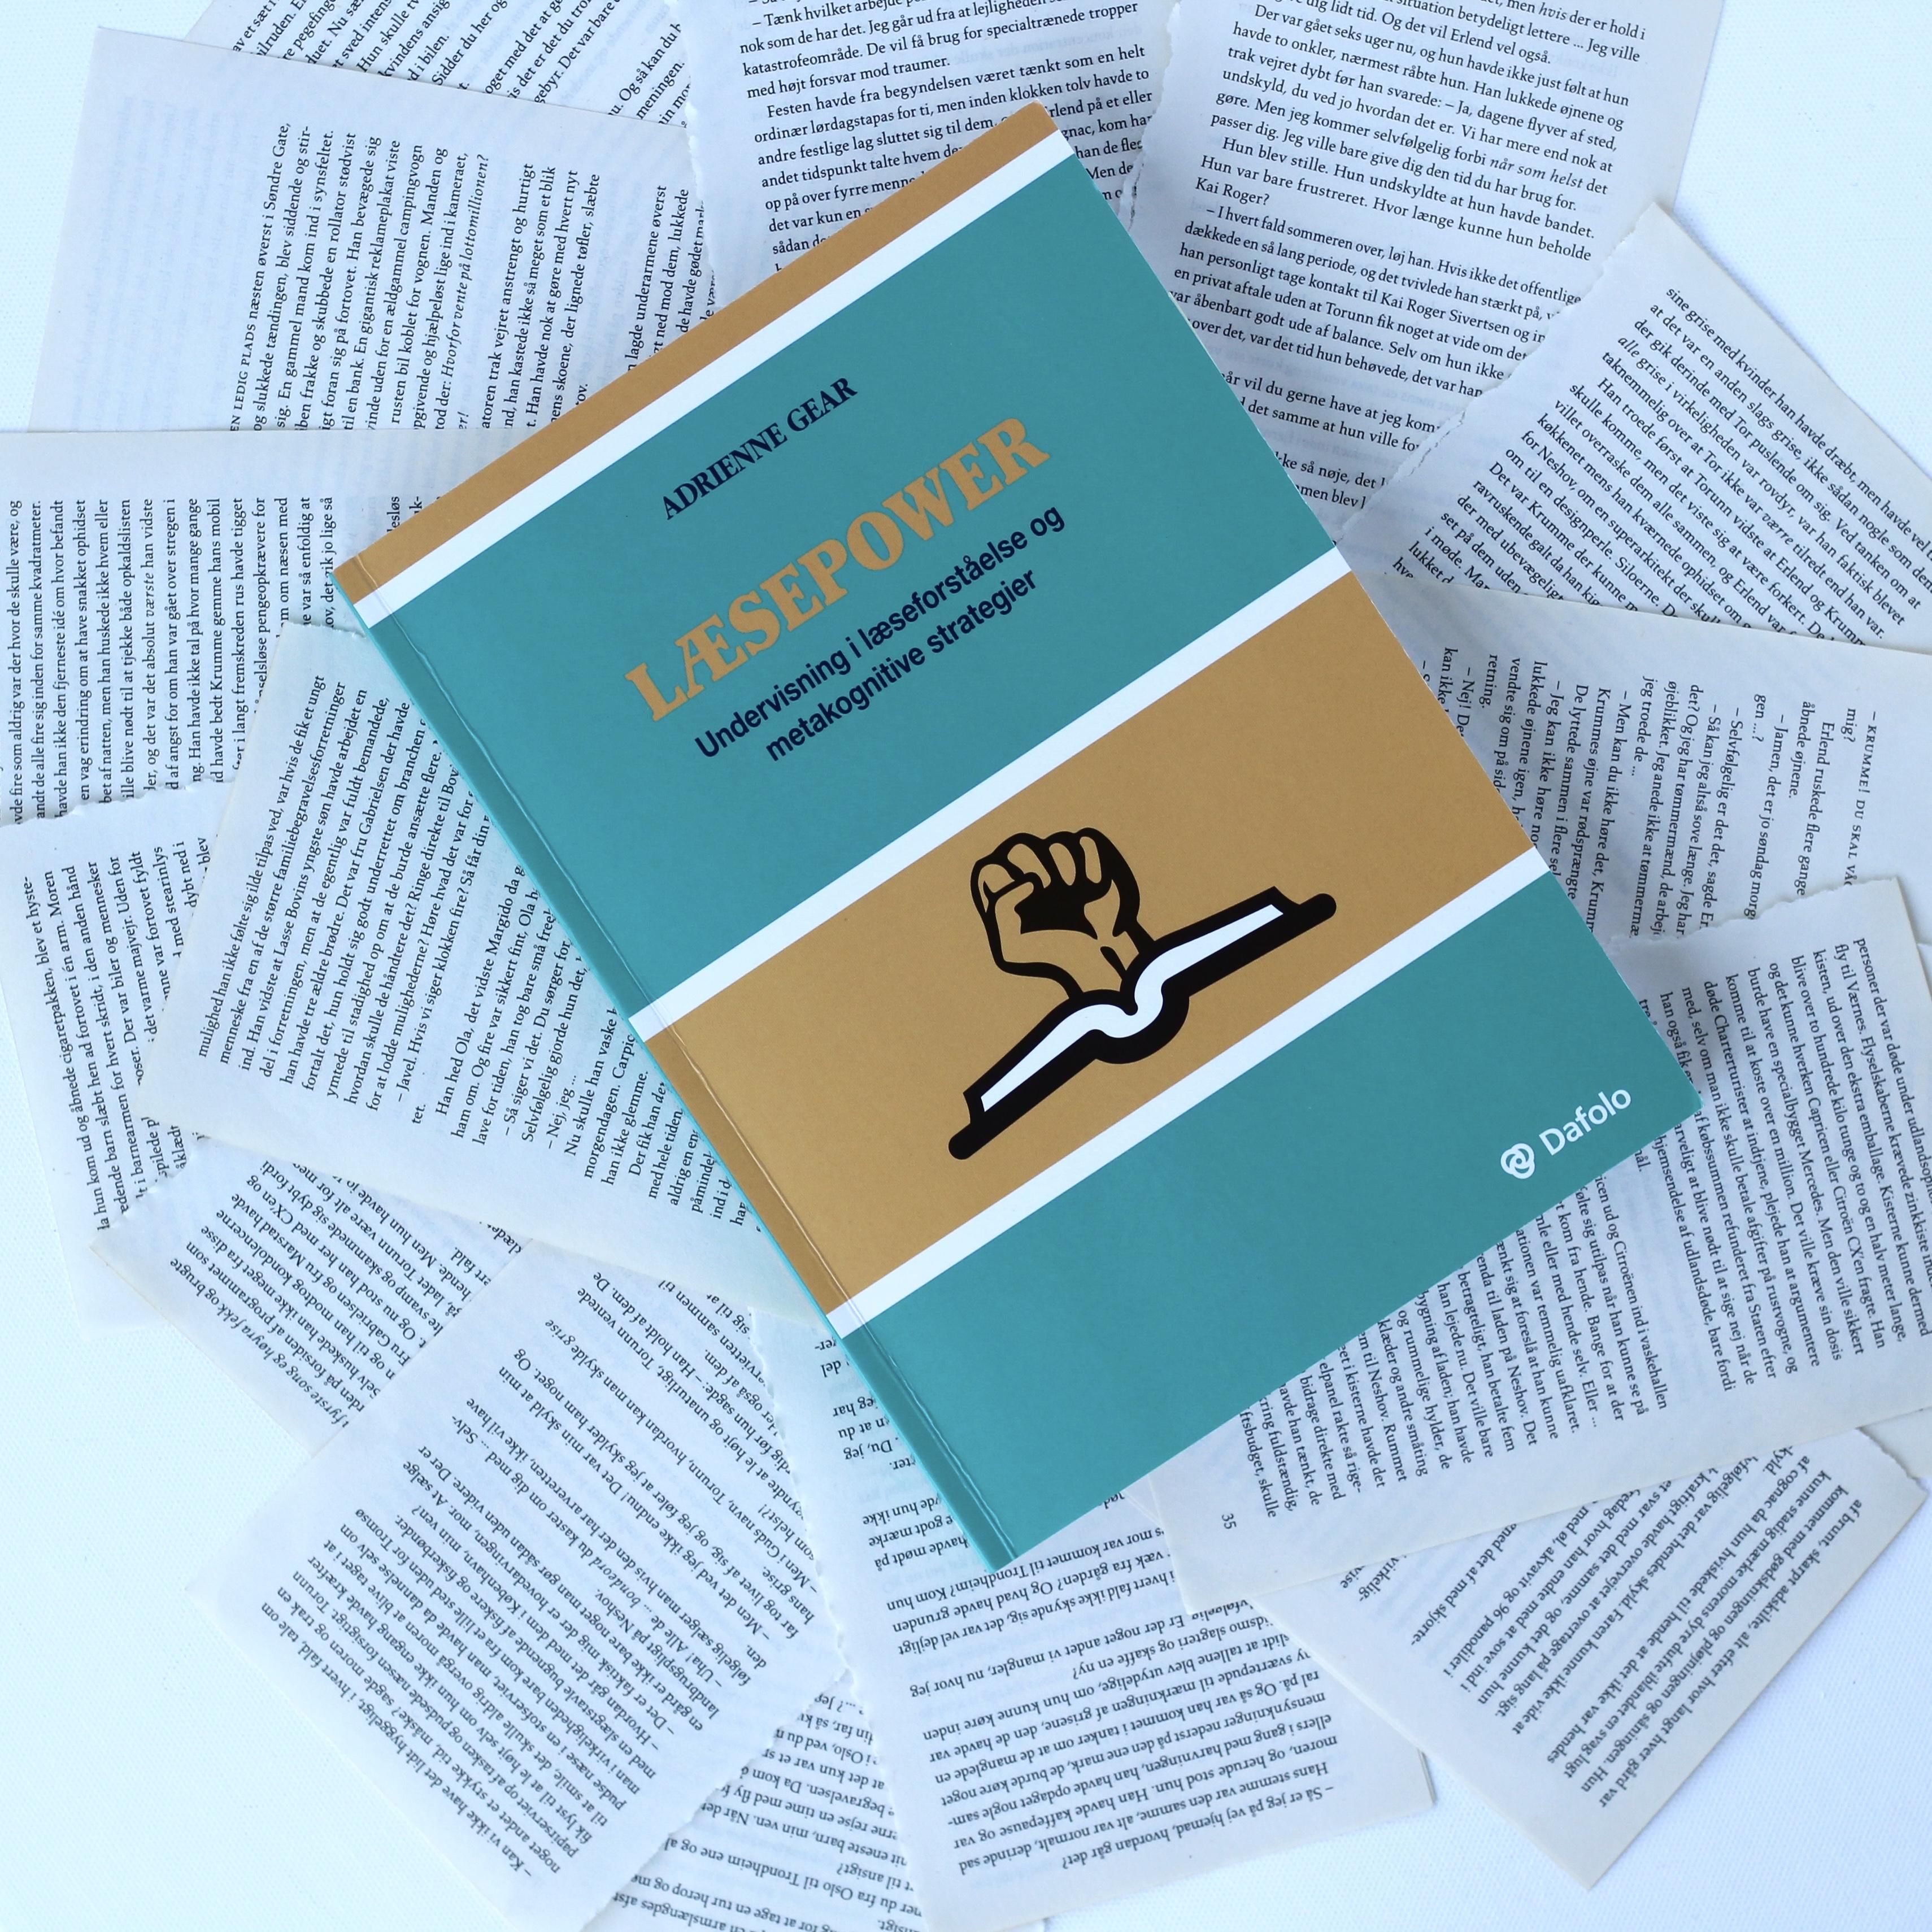 Adrienne Gear, Læsepower, Bogoplevelsen